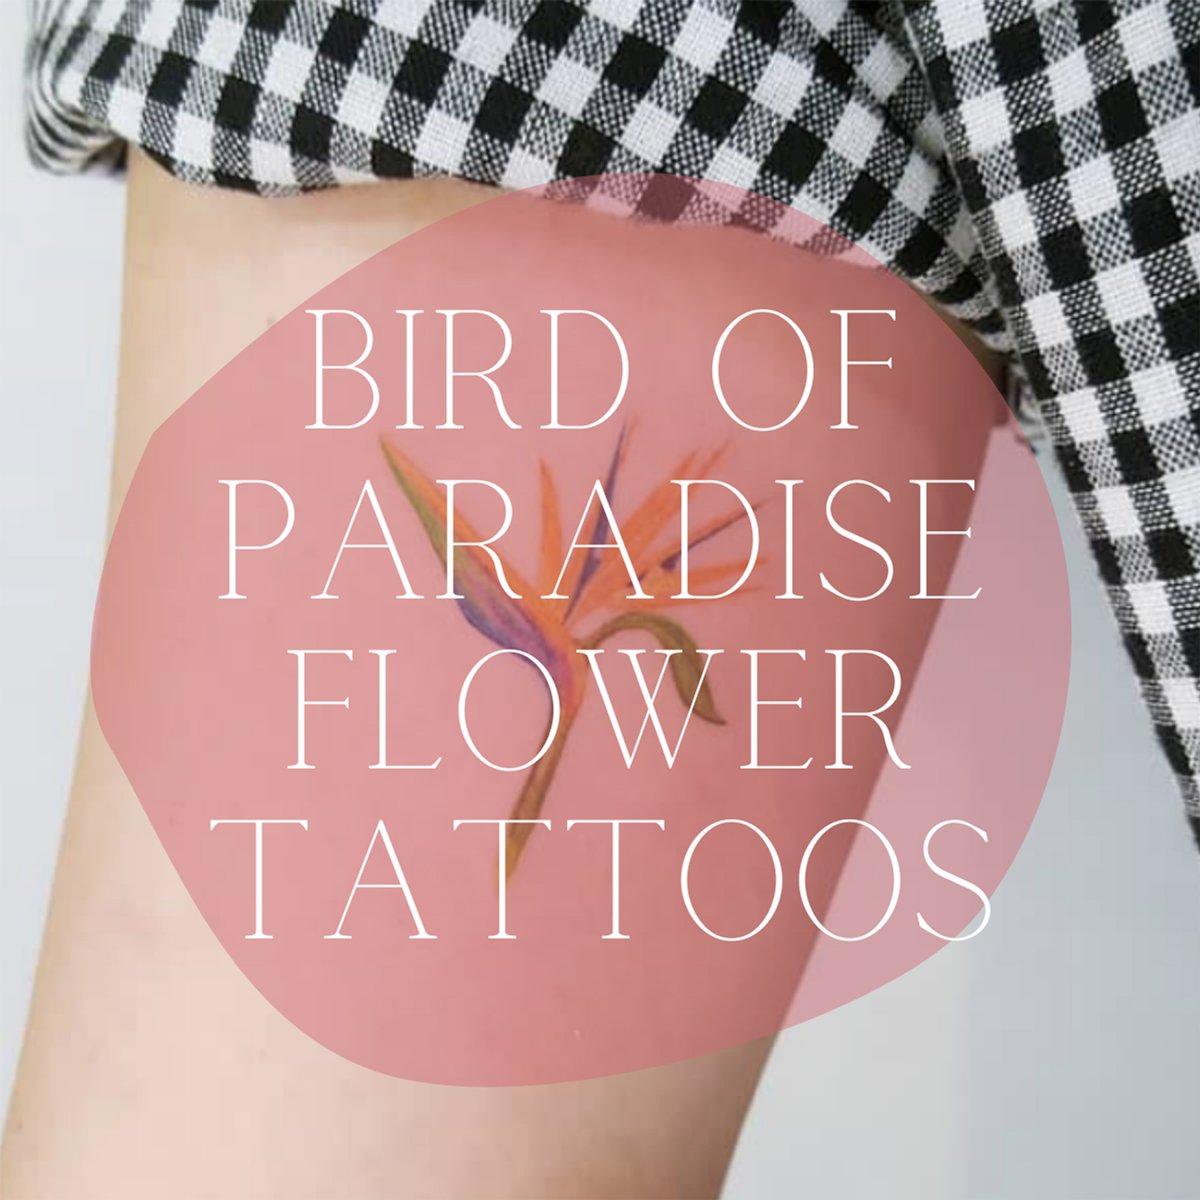 Bird of Paradise Flower Tattoos